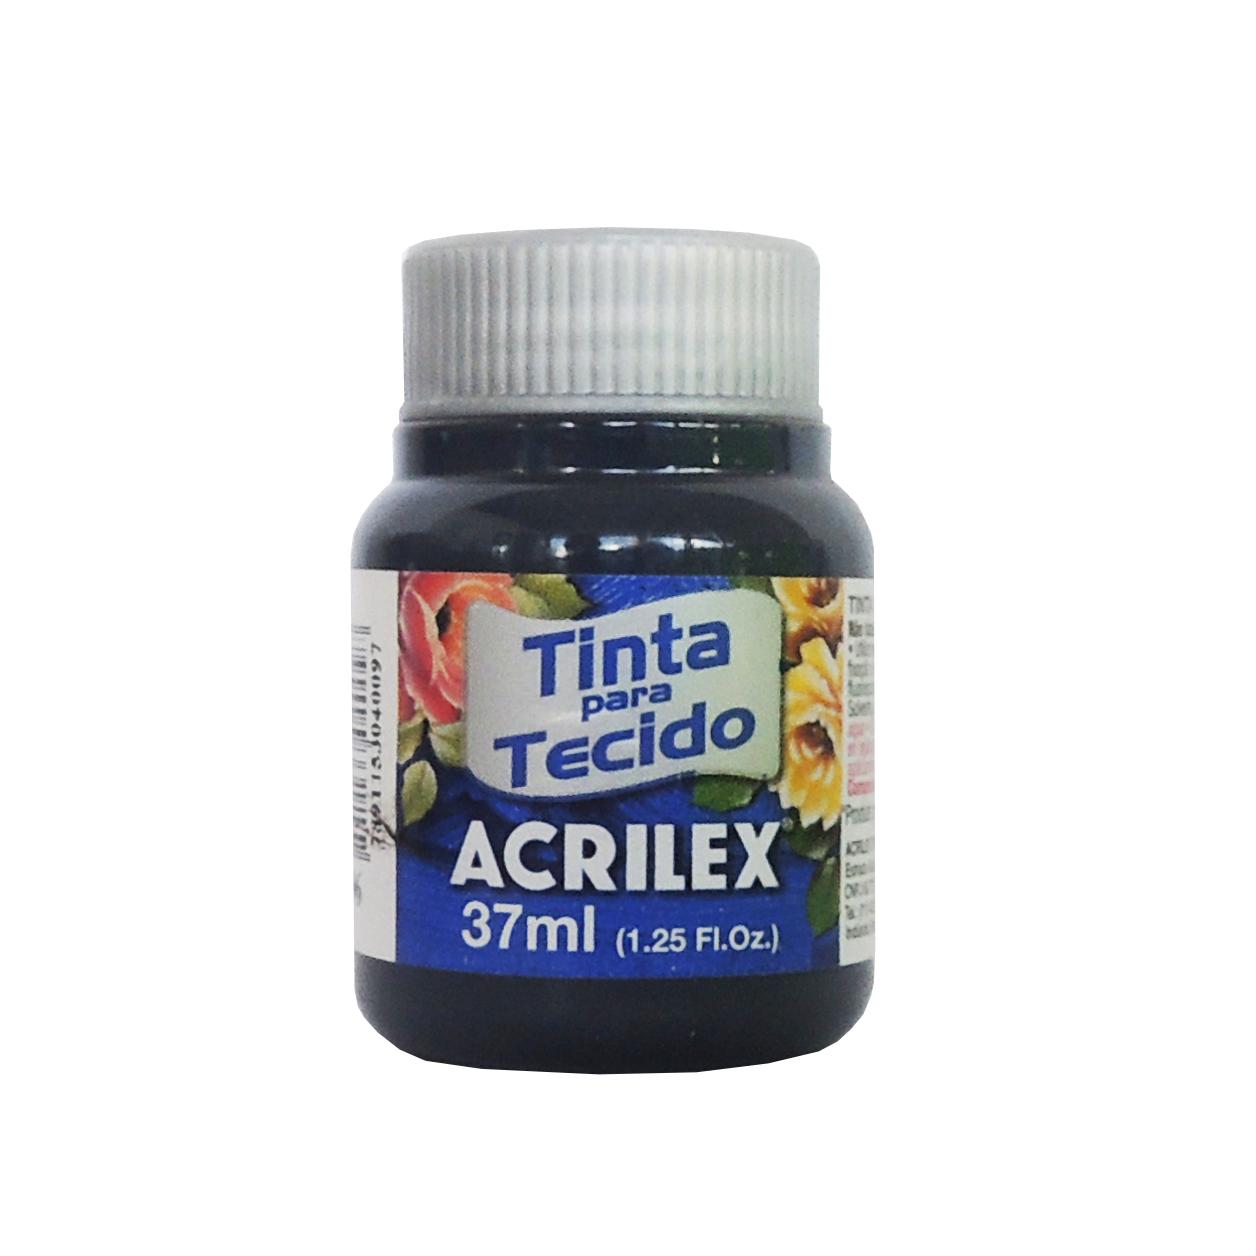 tinta-para-tecido-acrilex-37ml-596-azul-petroleo